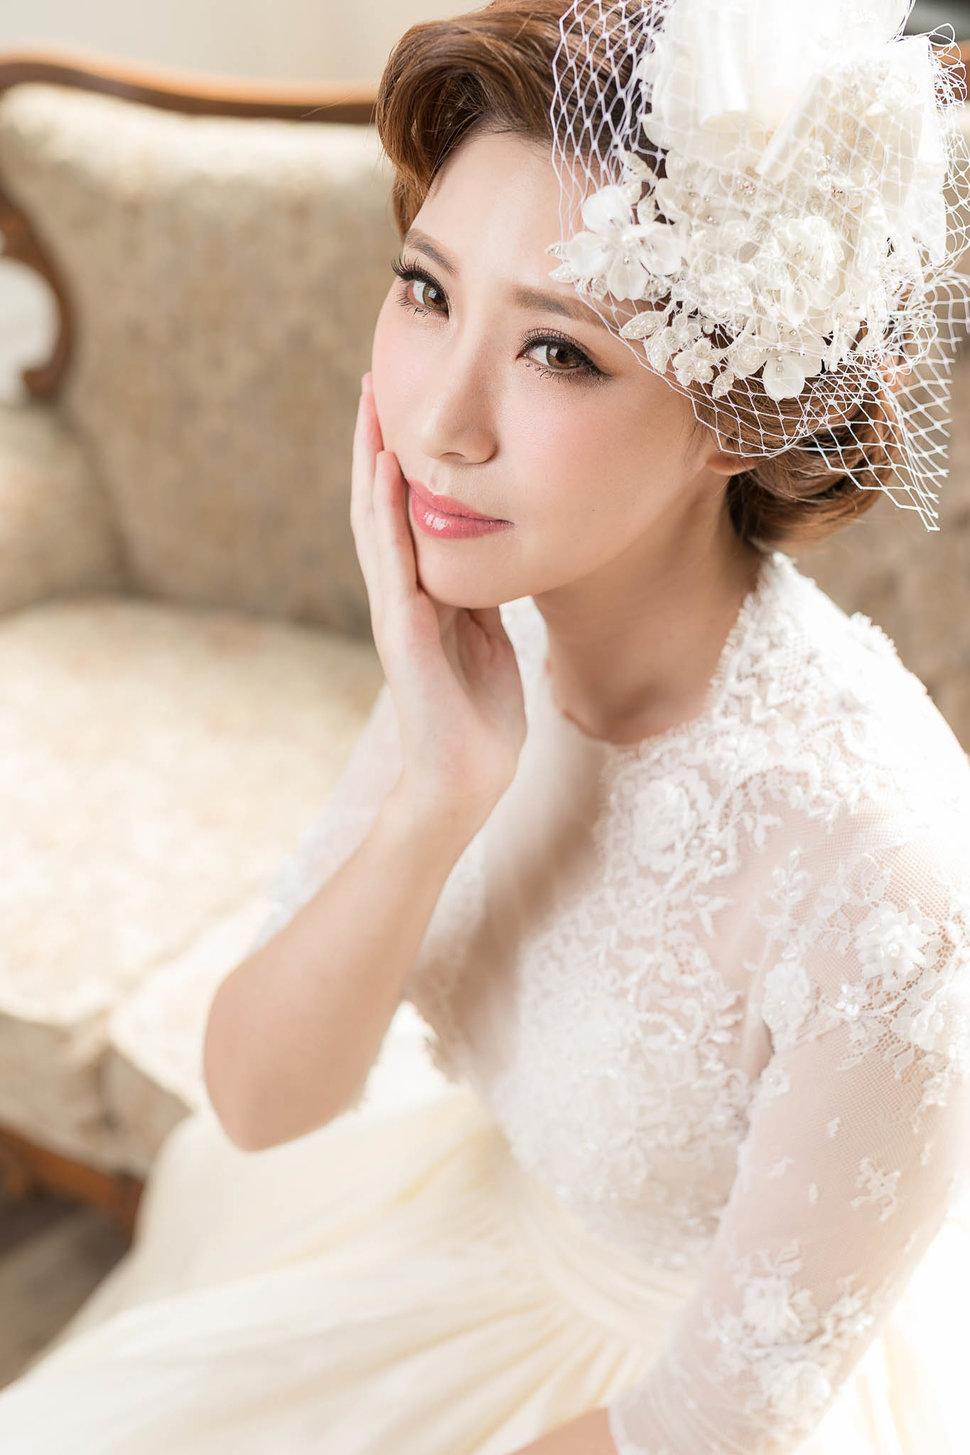 18PHOTO自主婚紗-潤兒(編號:406243) - 18PHOTO 婚紗影像攝影工作室 - 結婚吧一站式婚禮服務平台